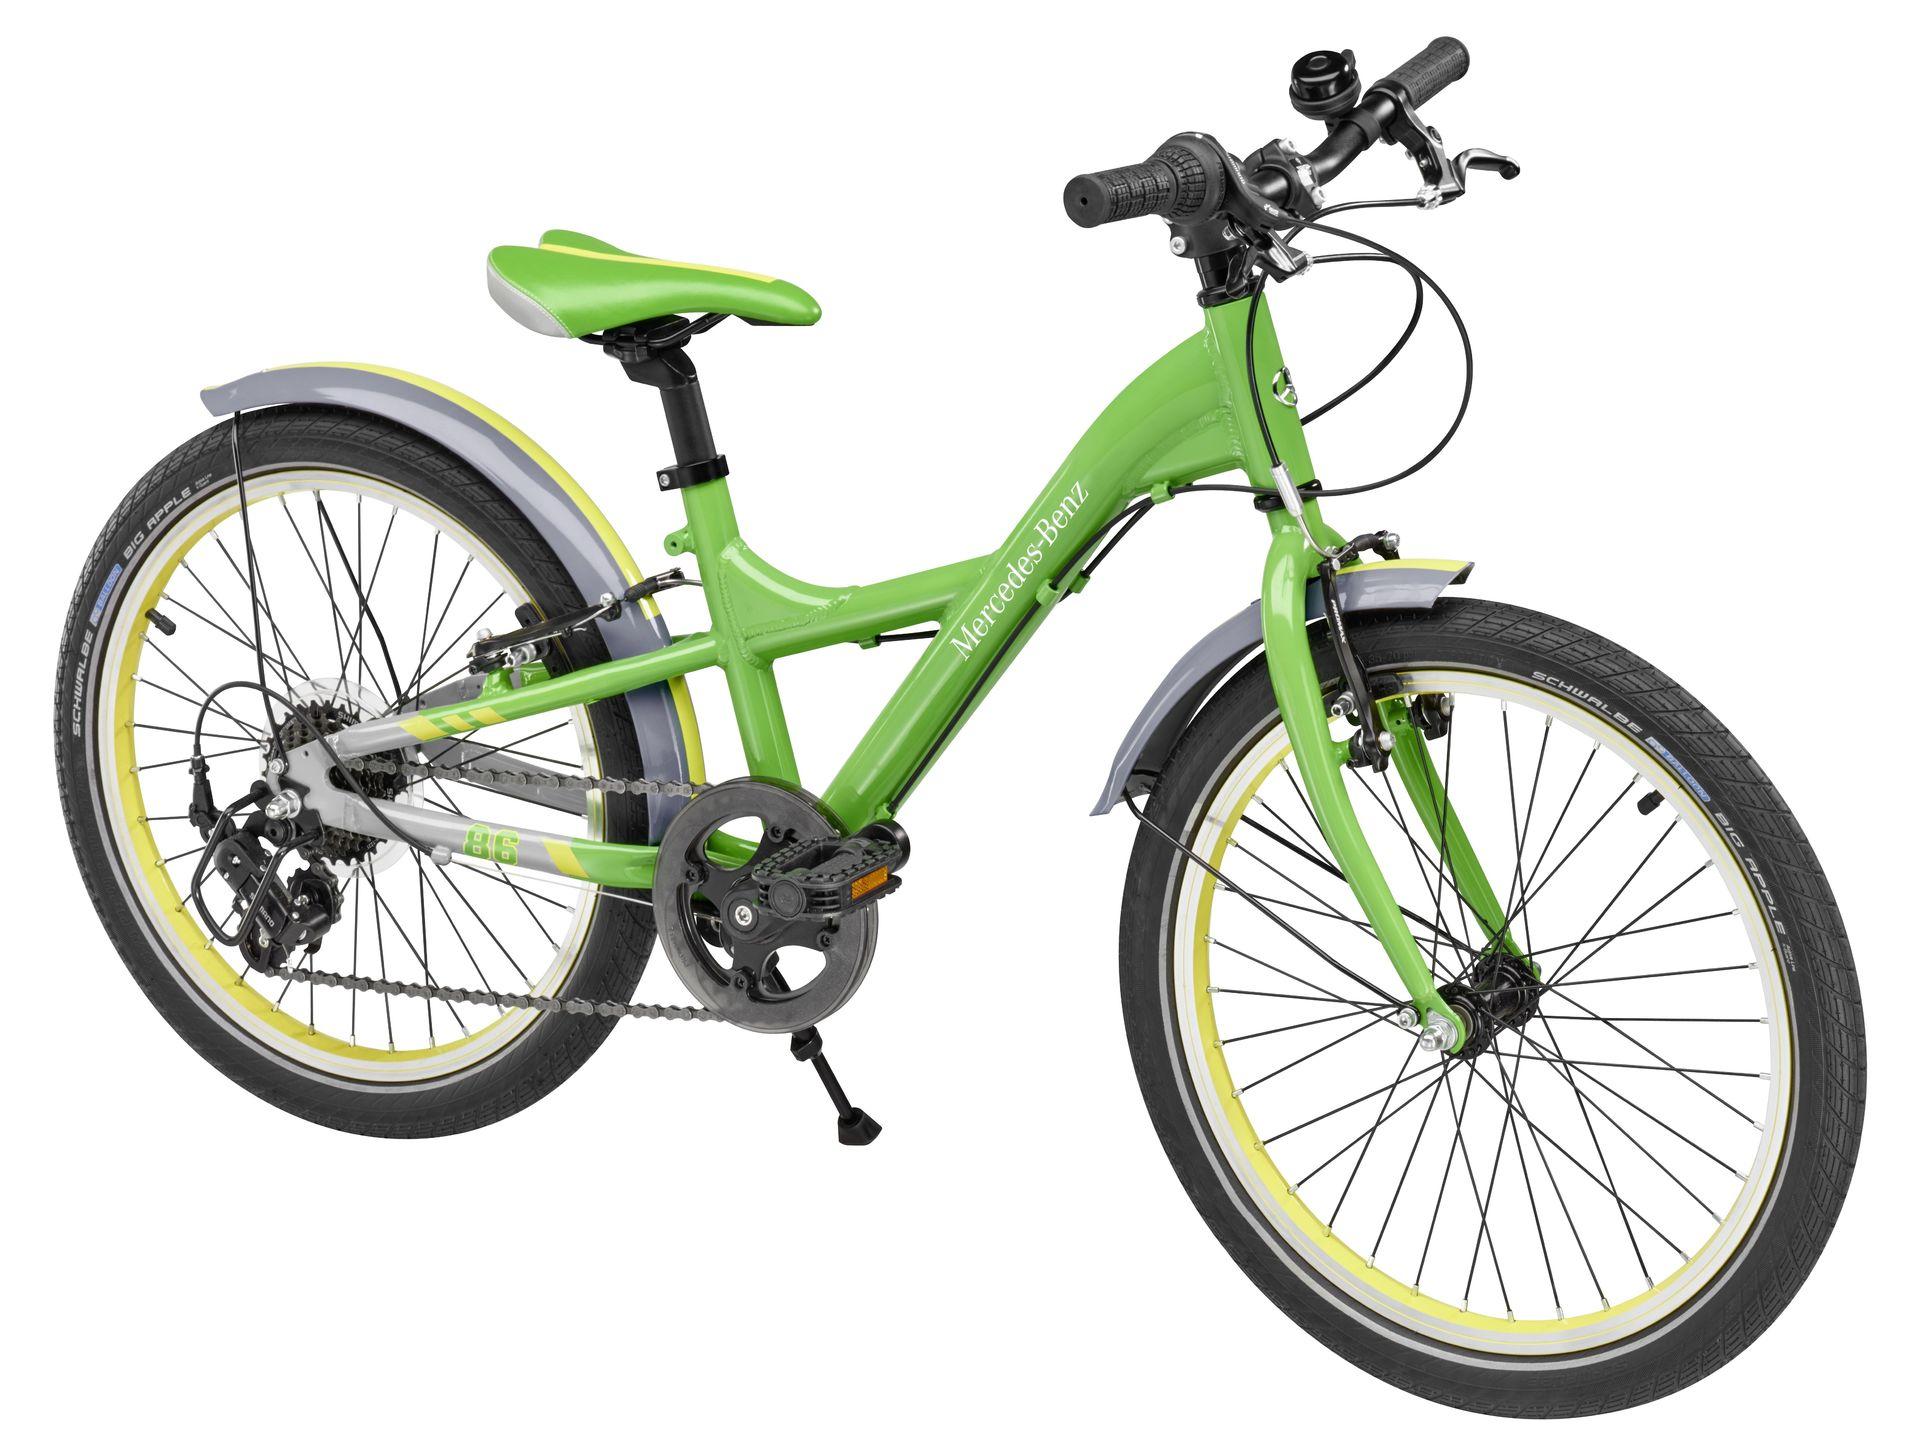 Детский велосипед Mercedes-Benz Chidren's Bike, Green